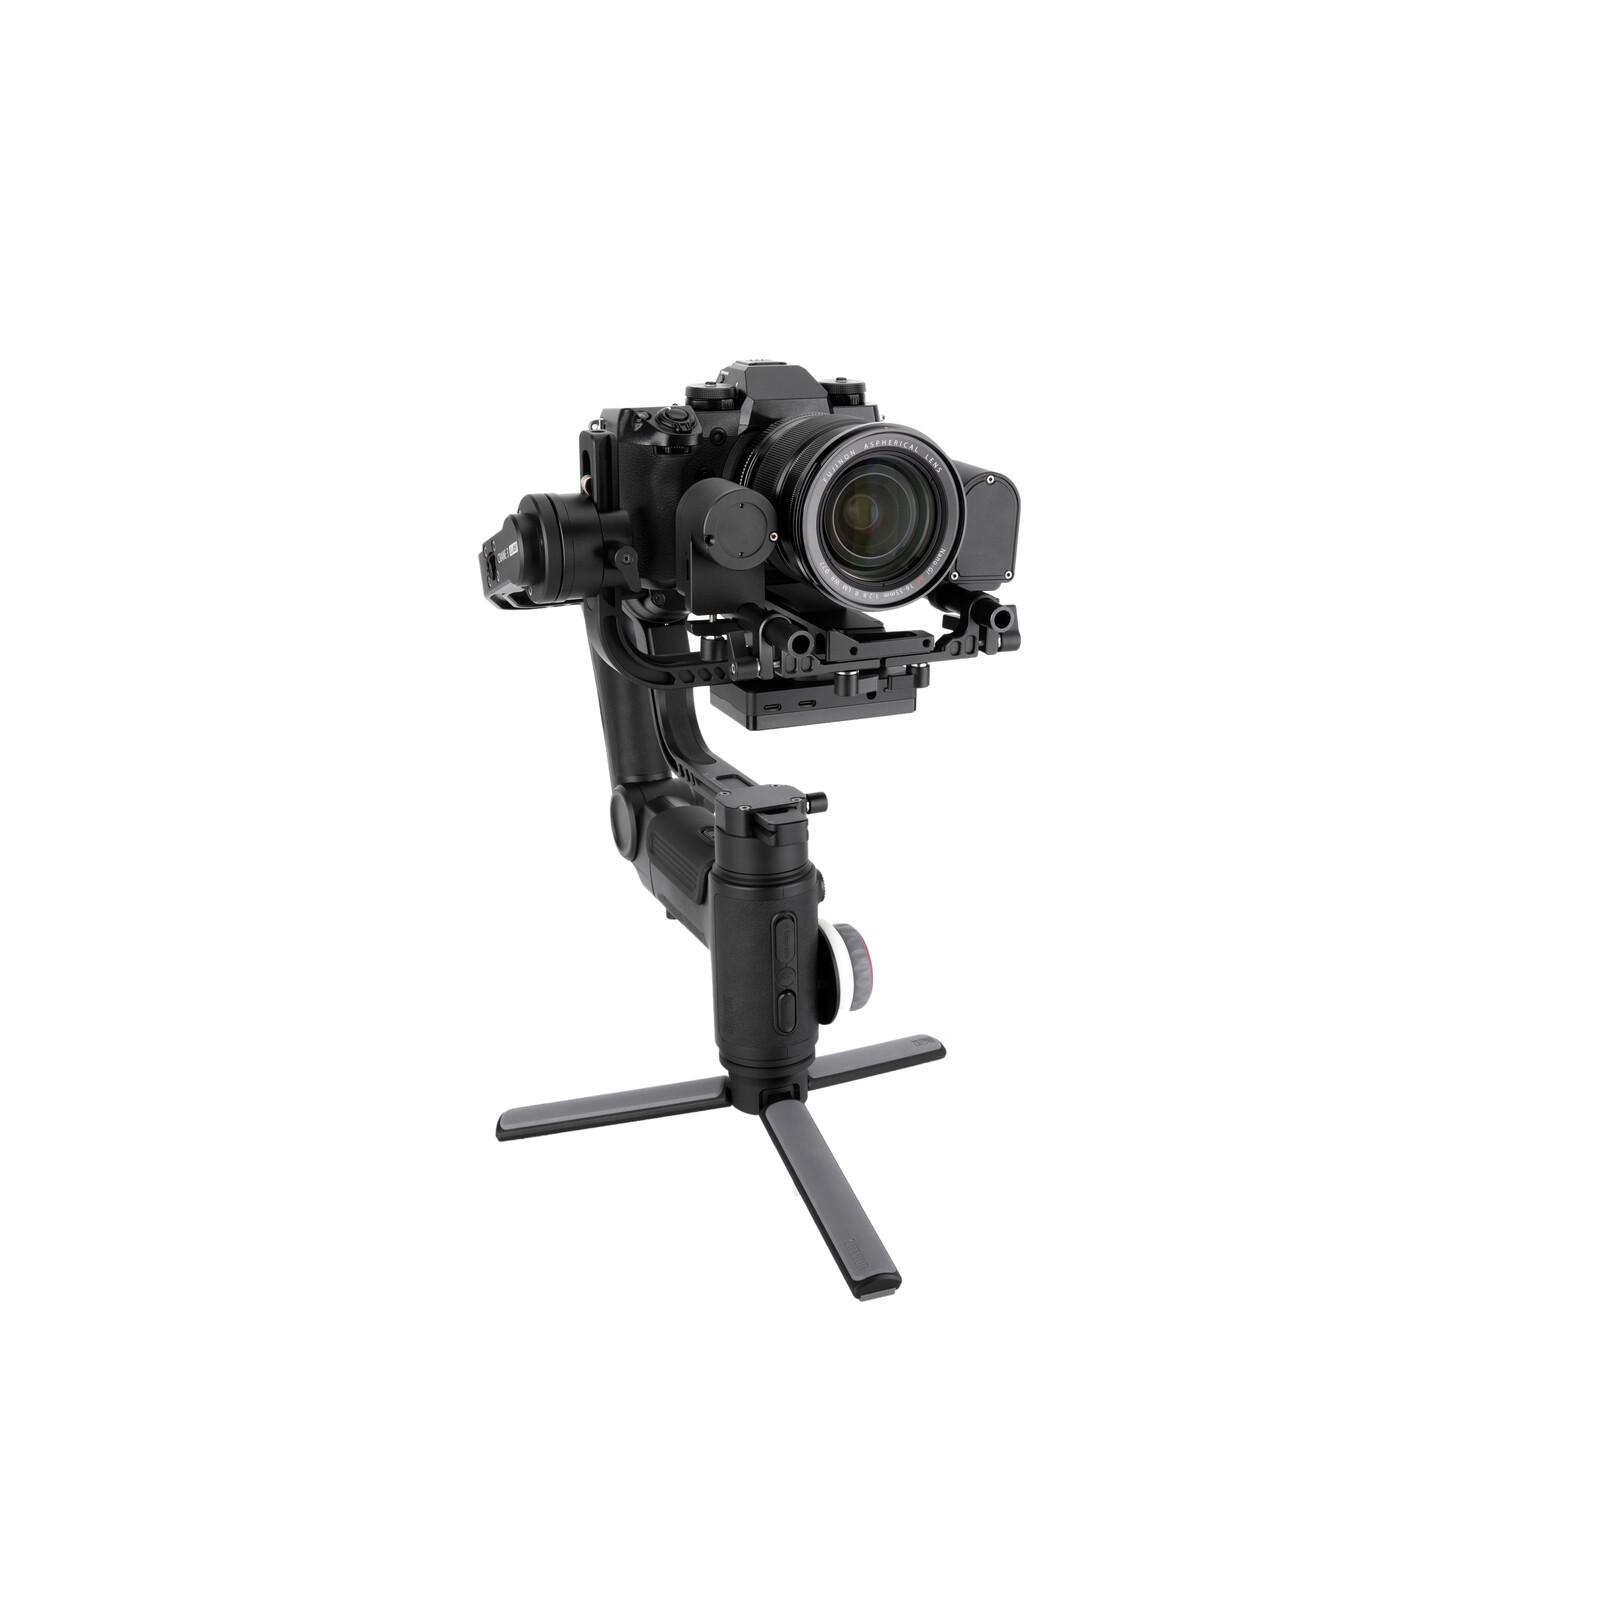 Zhiyun Crane 3 LAB 3 Axis Handheld Gimbal Stabilizer Creator